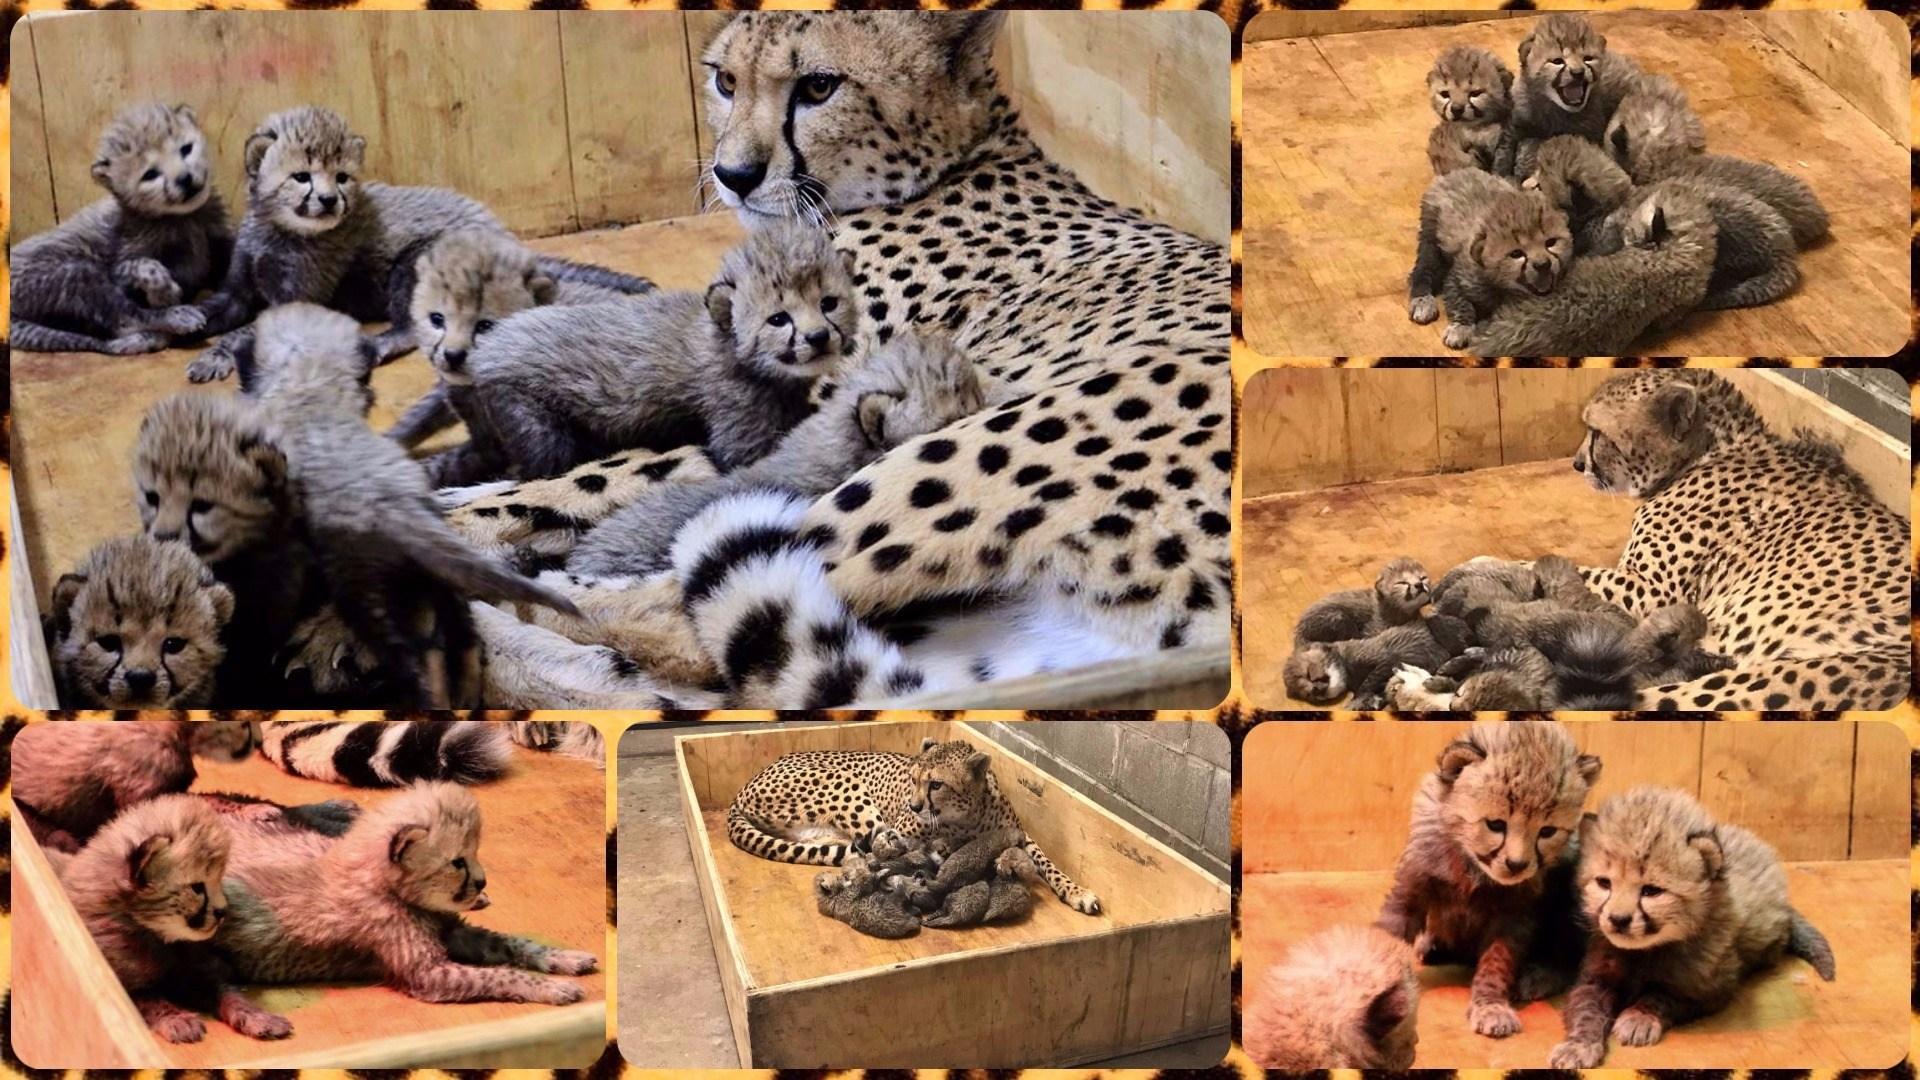 (Source: St. Louis Zoo)